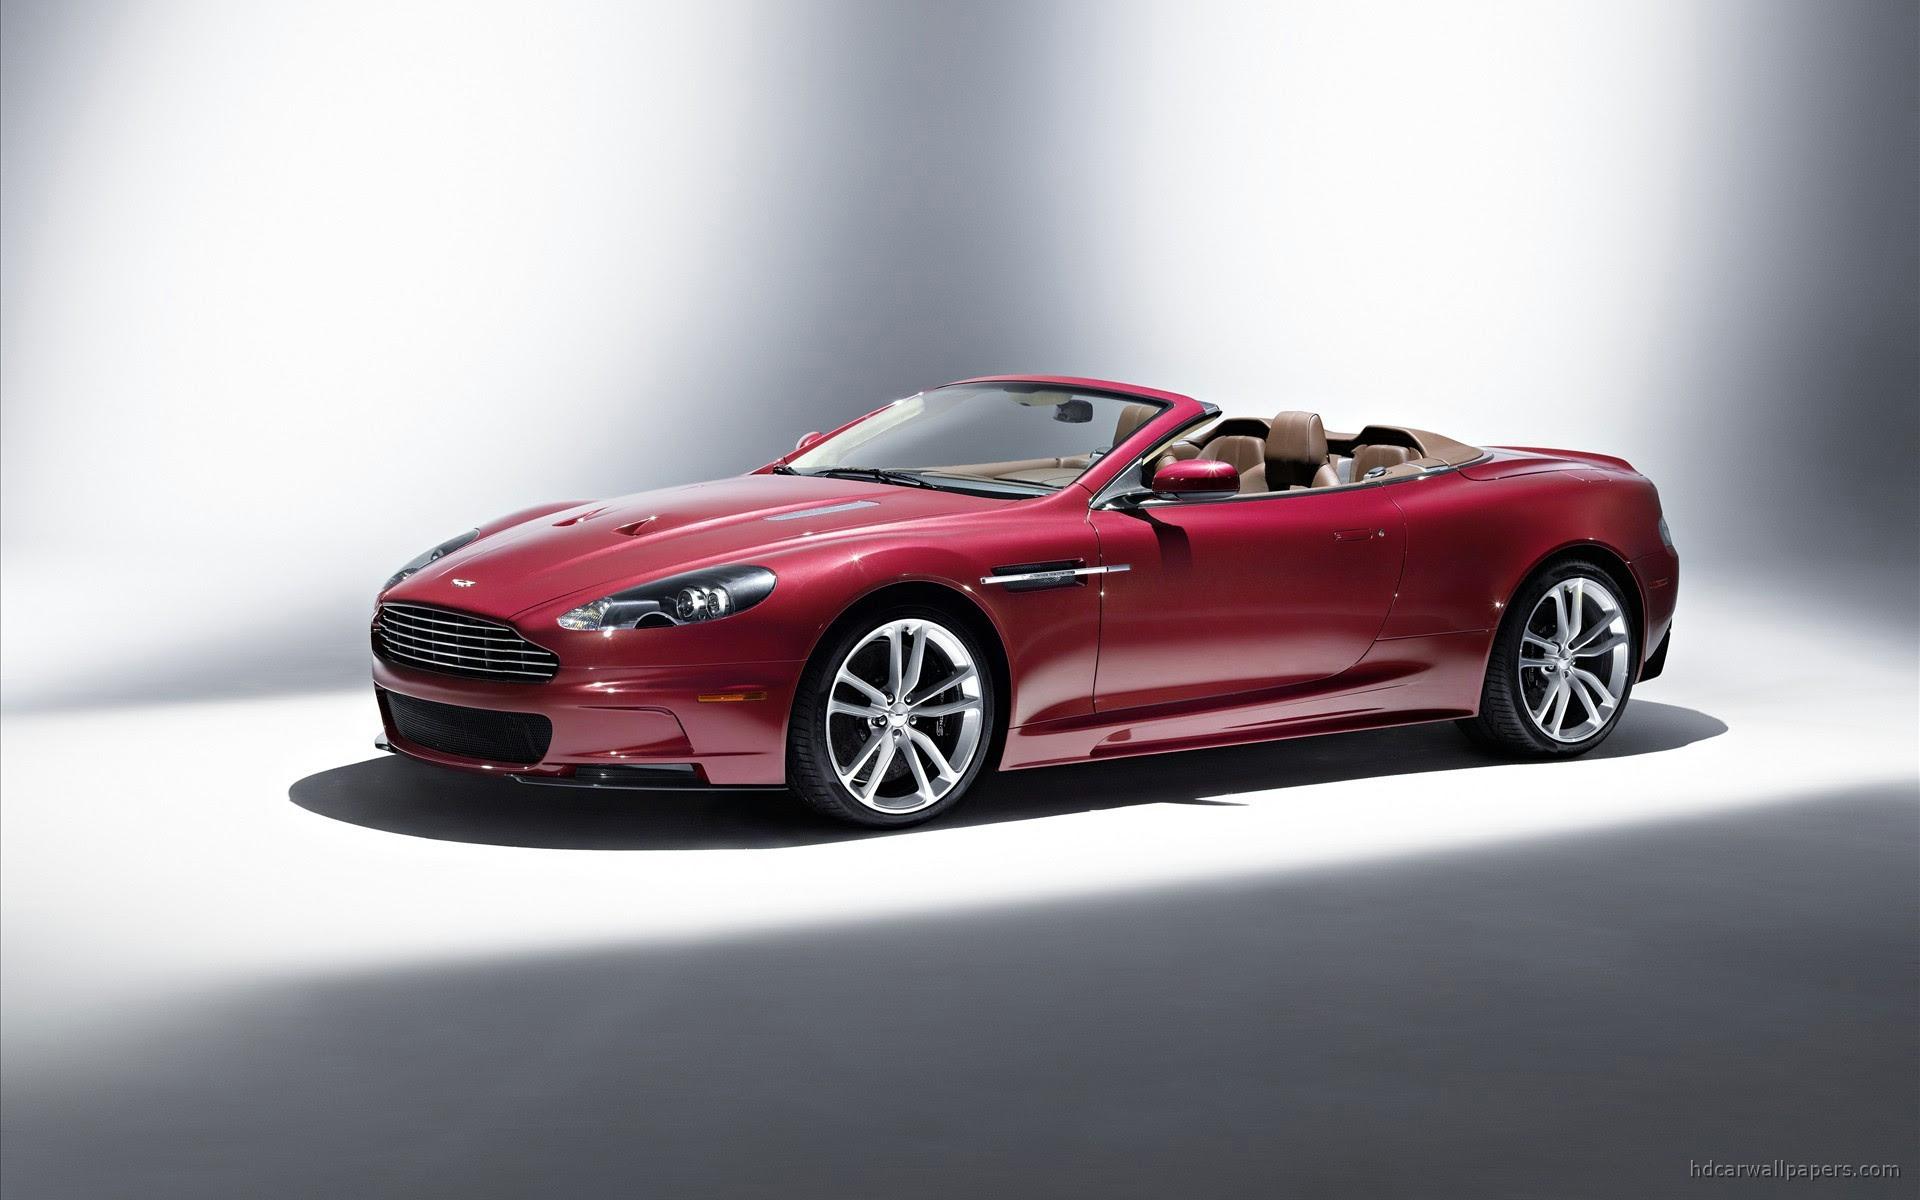 2010 Aston Martin DB